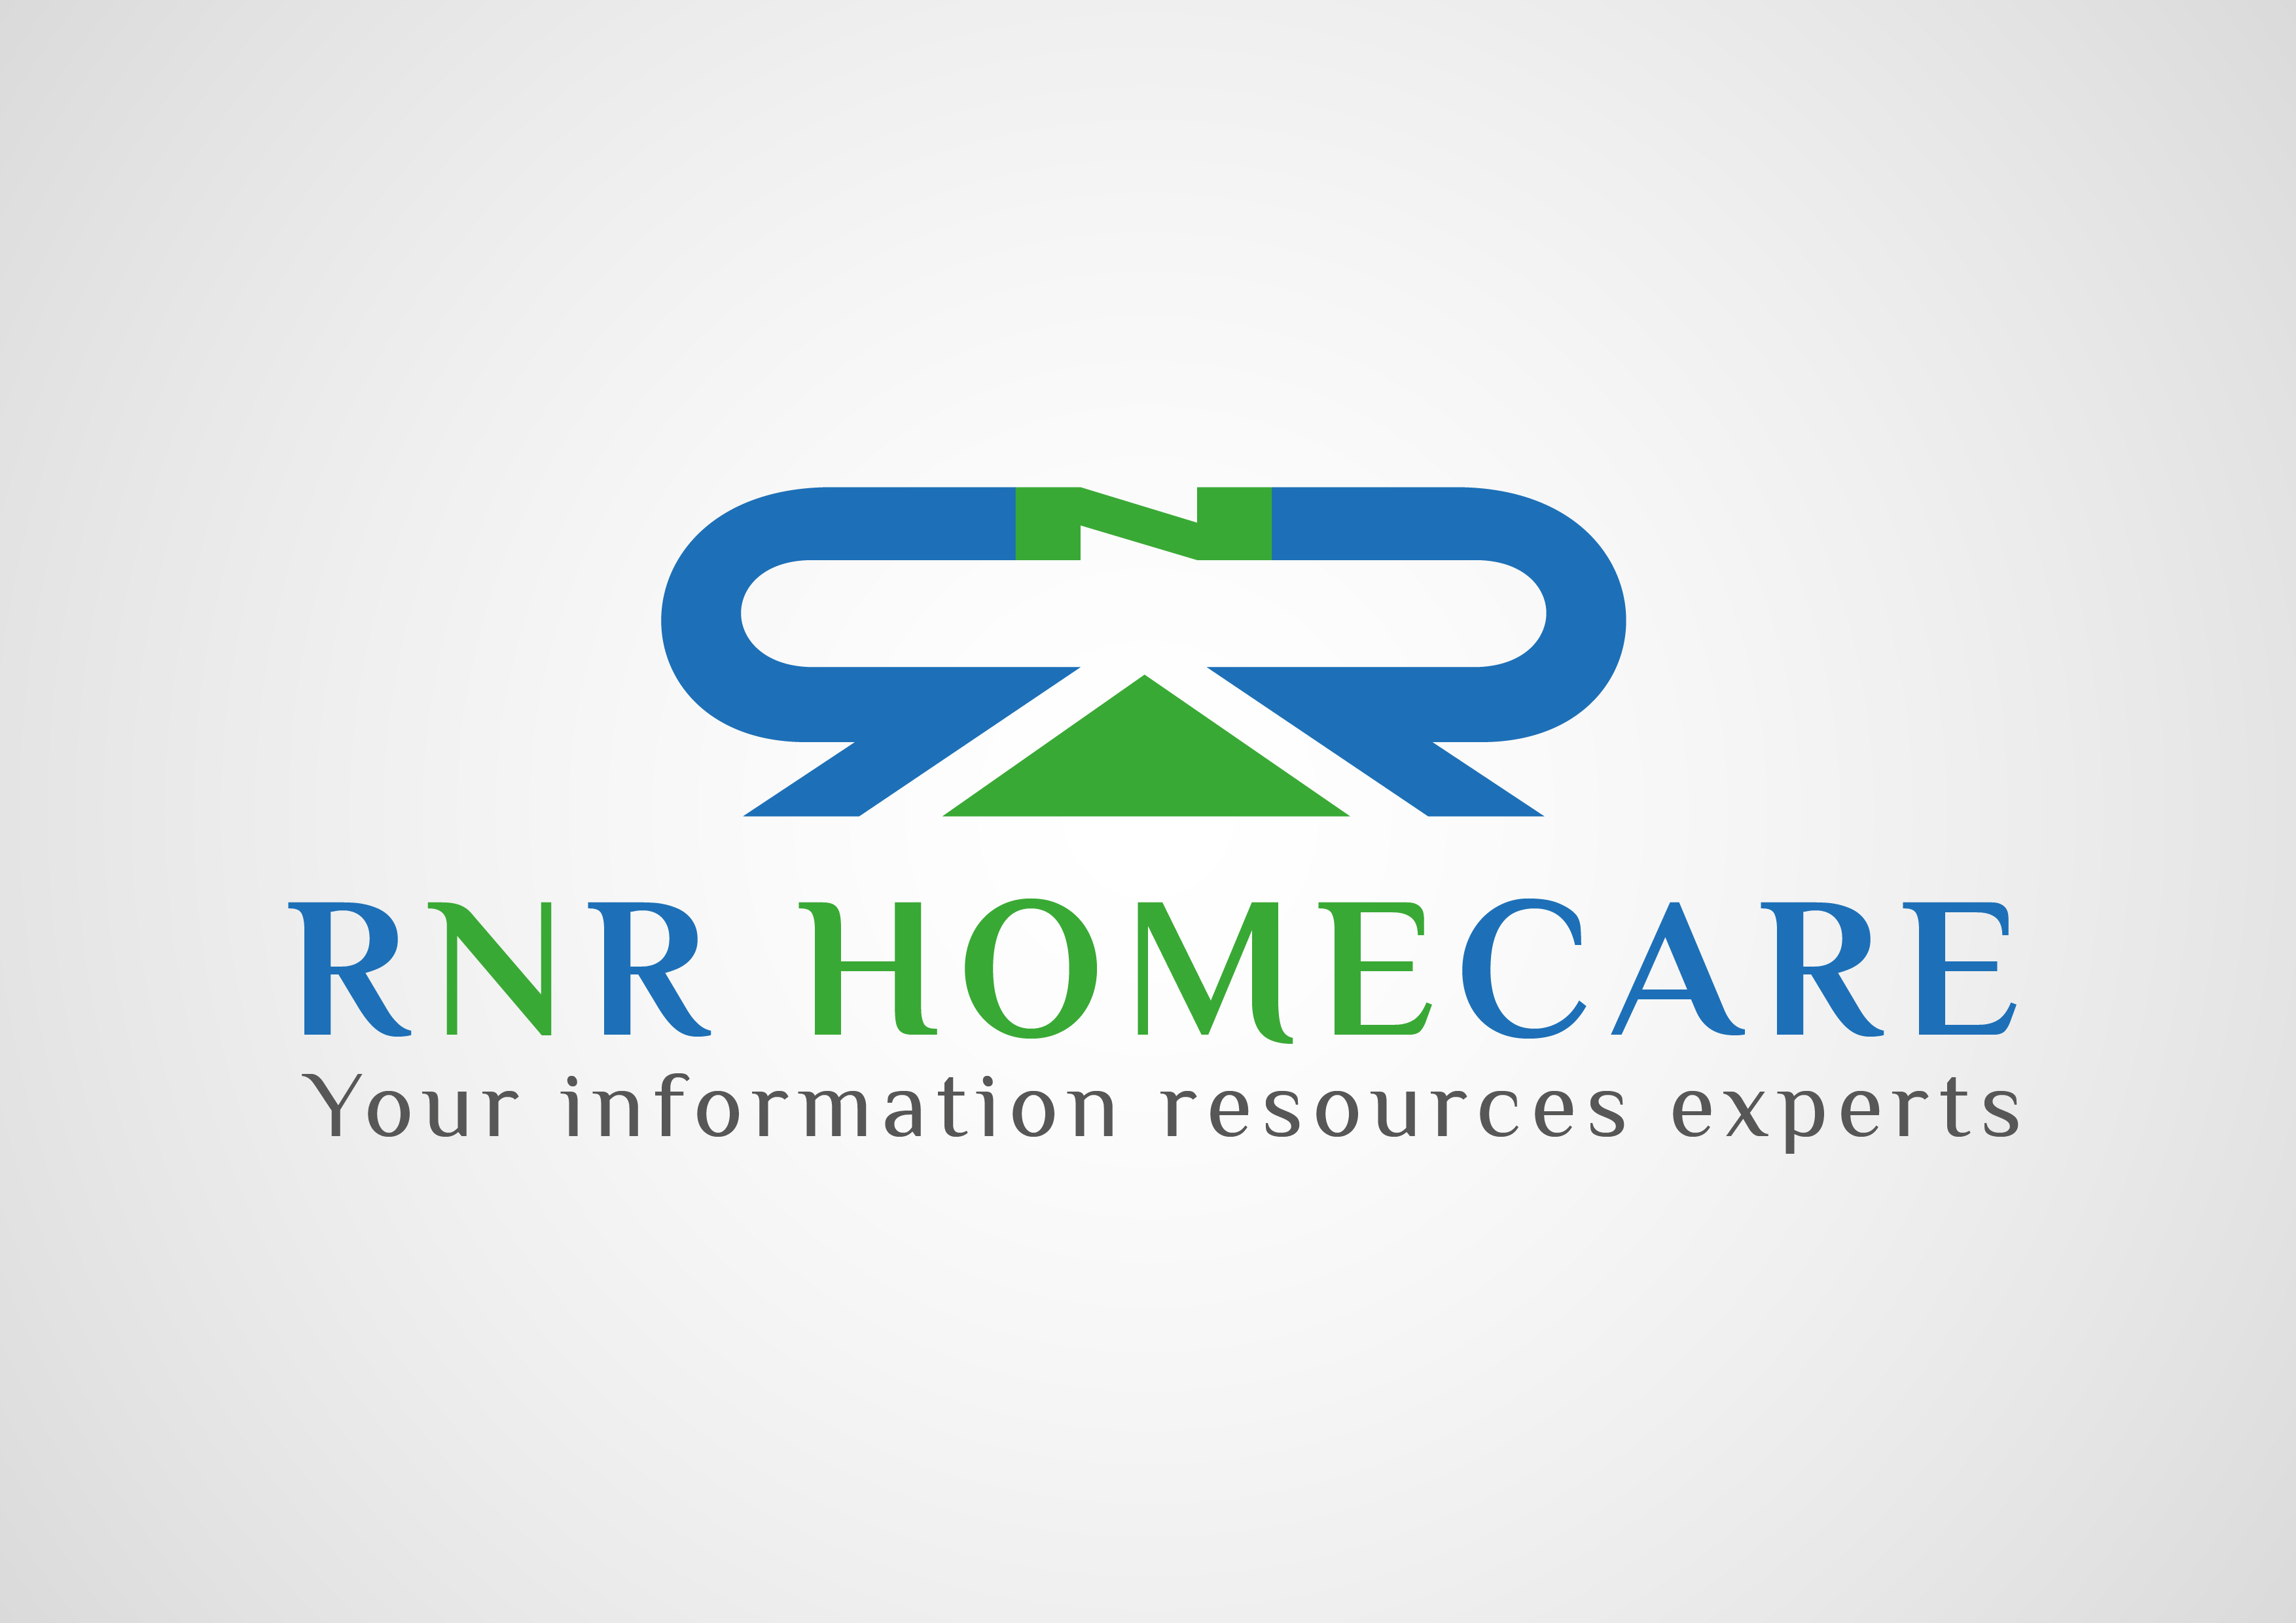 Logo Design by 3draw - Entry No. 14 in the Logo Design Contest Imaginative Logo Design for RNR HomeCare.